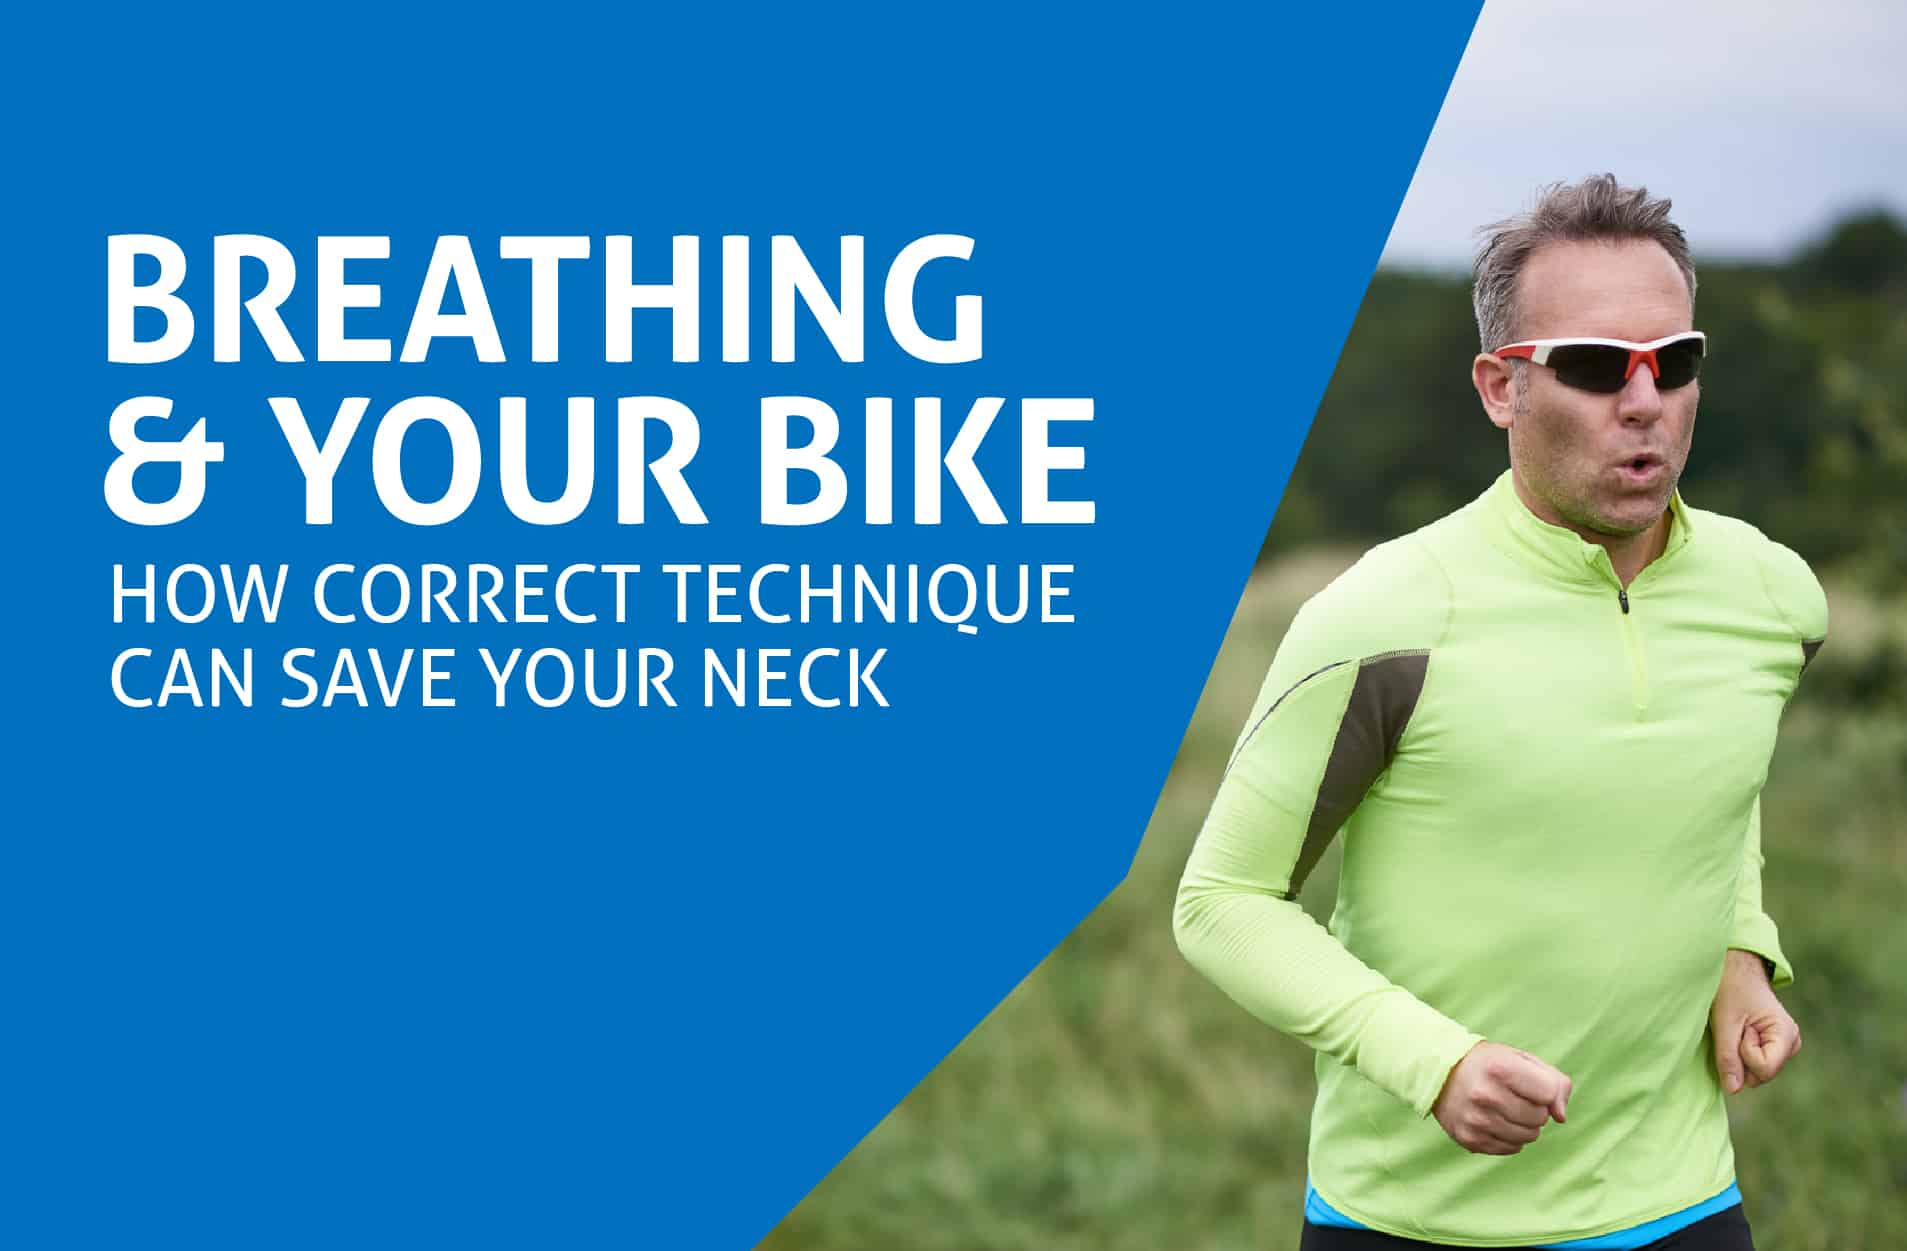 BREATHING & YOUR BIKE